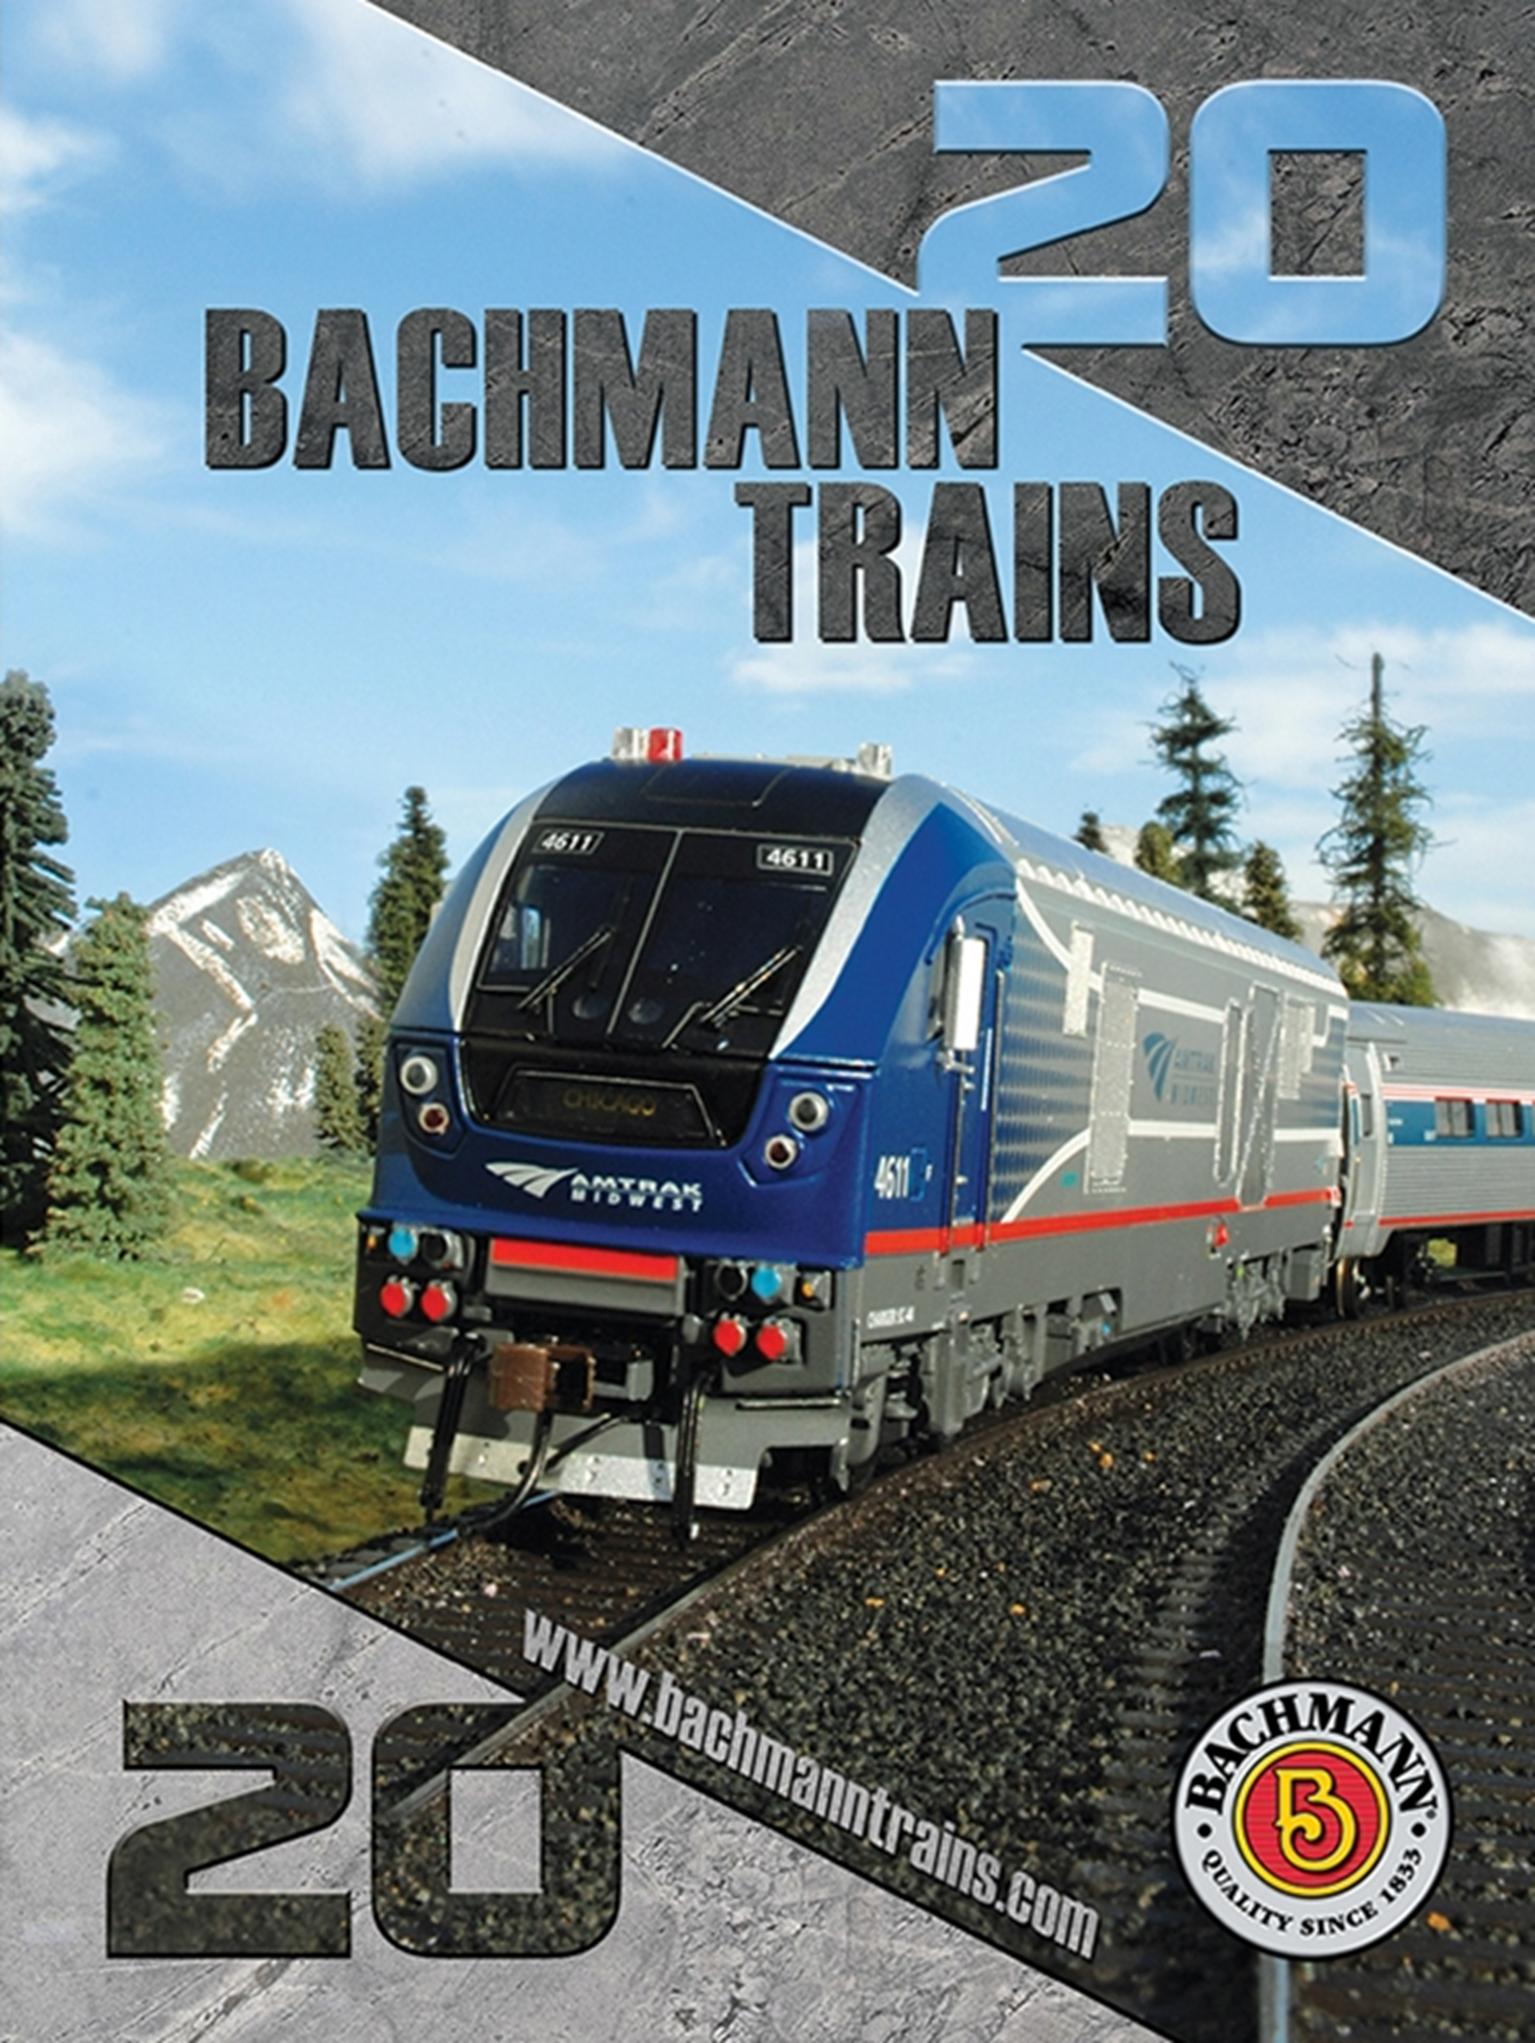 2020 Bachmann Trains Catalog (USA)